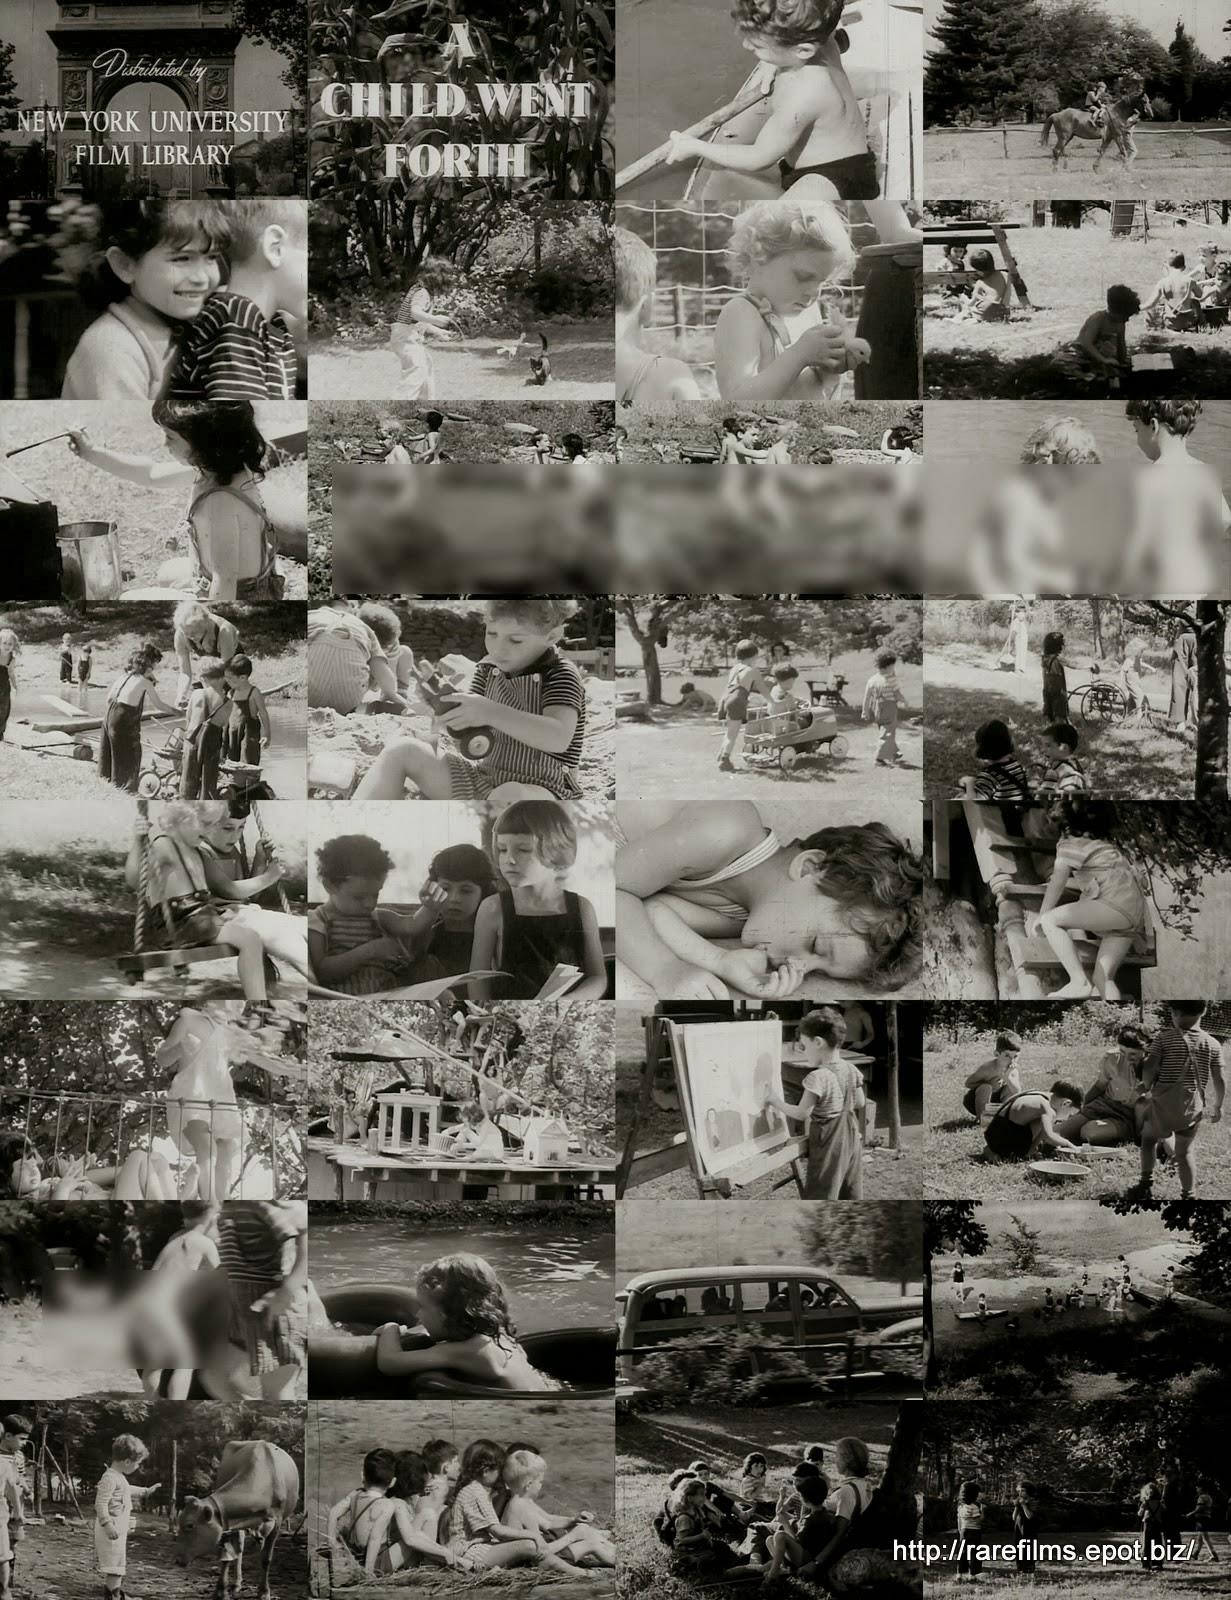 Познавая мир / A Child Went Forth. 1941.